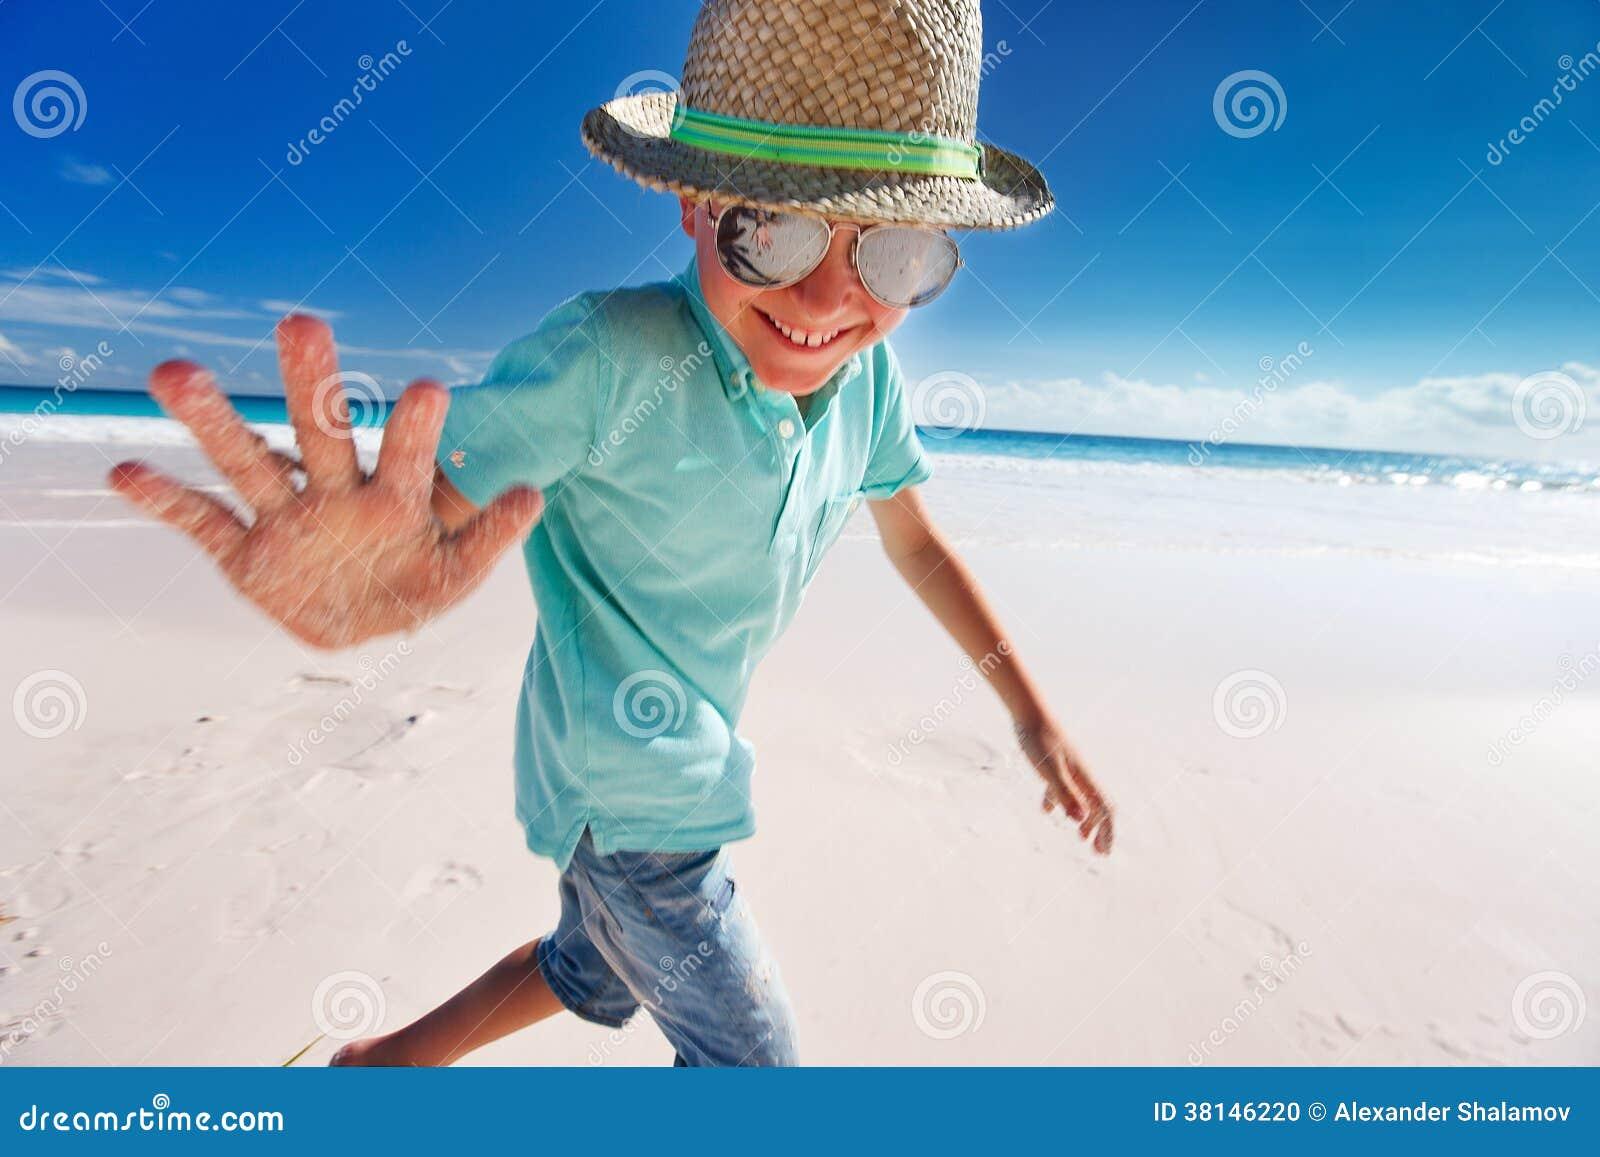 Little boy on vacation